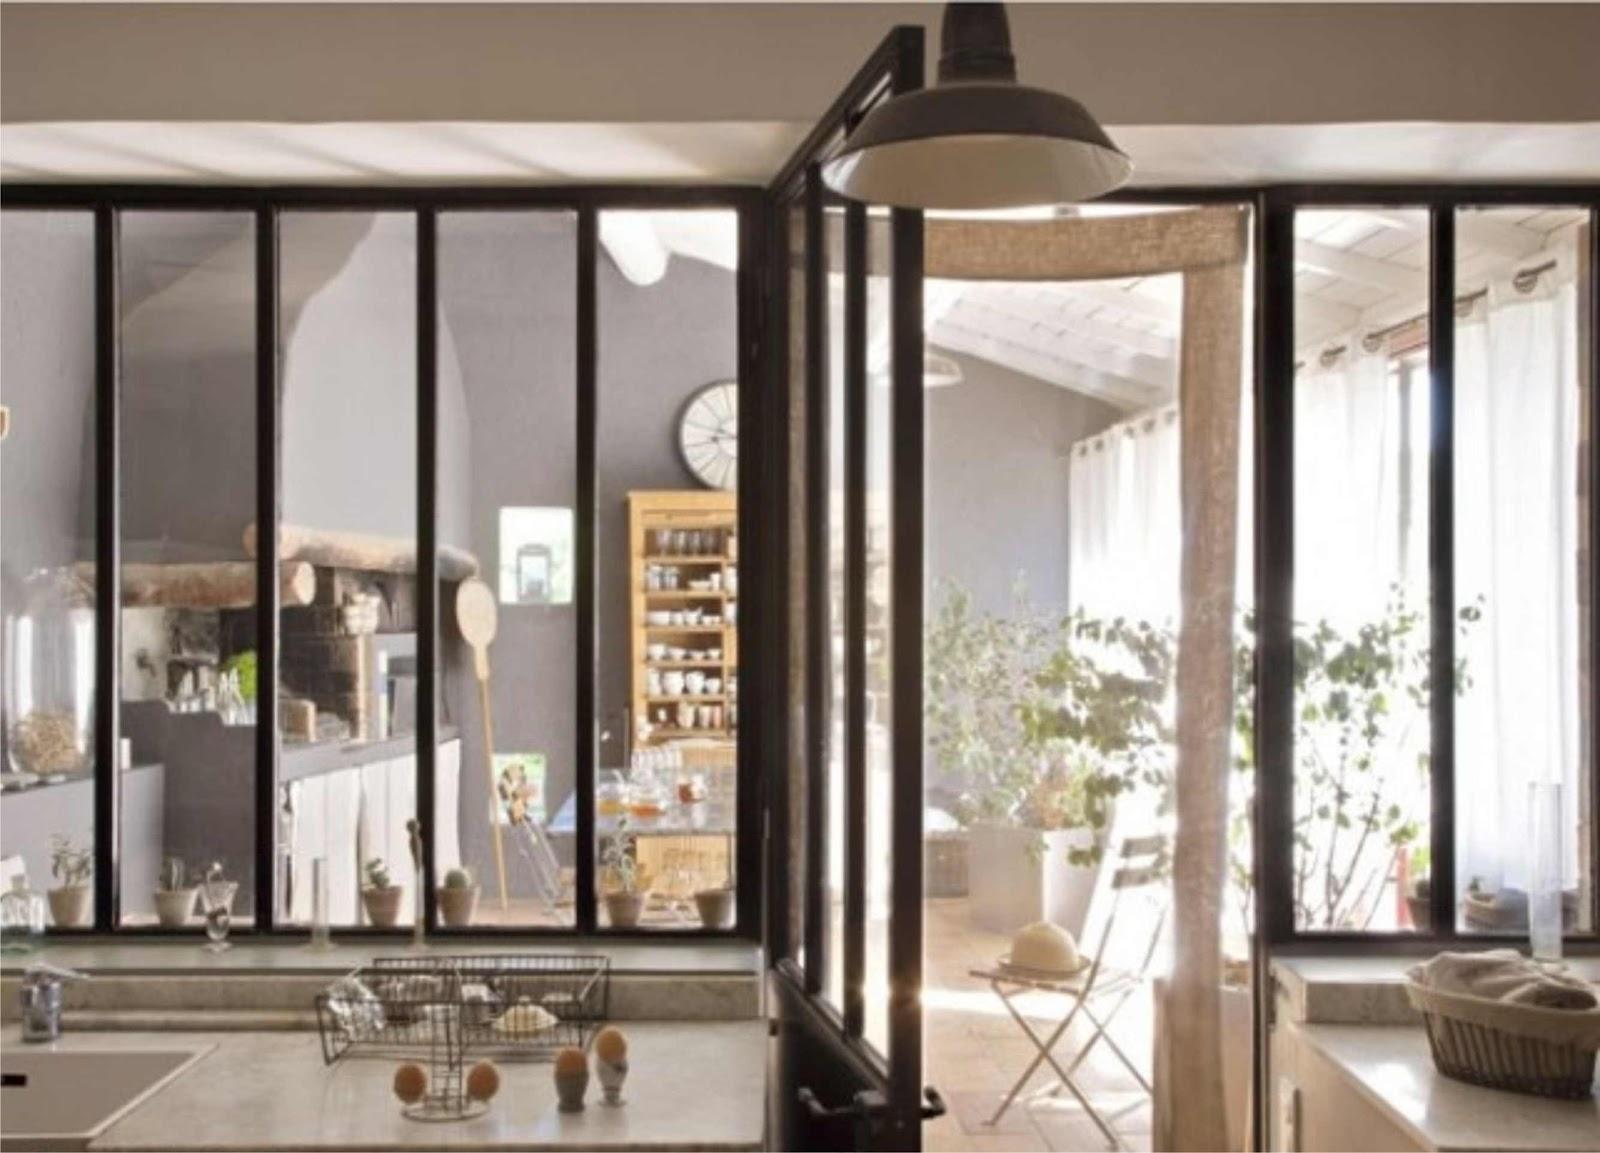 home una vieja casa provenzal virlova style. Black Bedroom Furniture Sets. Home Design Ideas